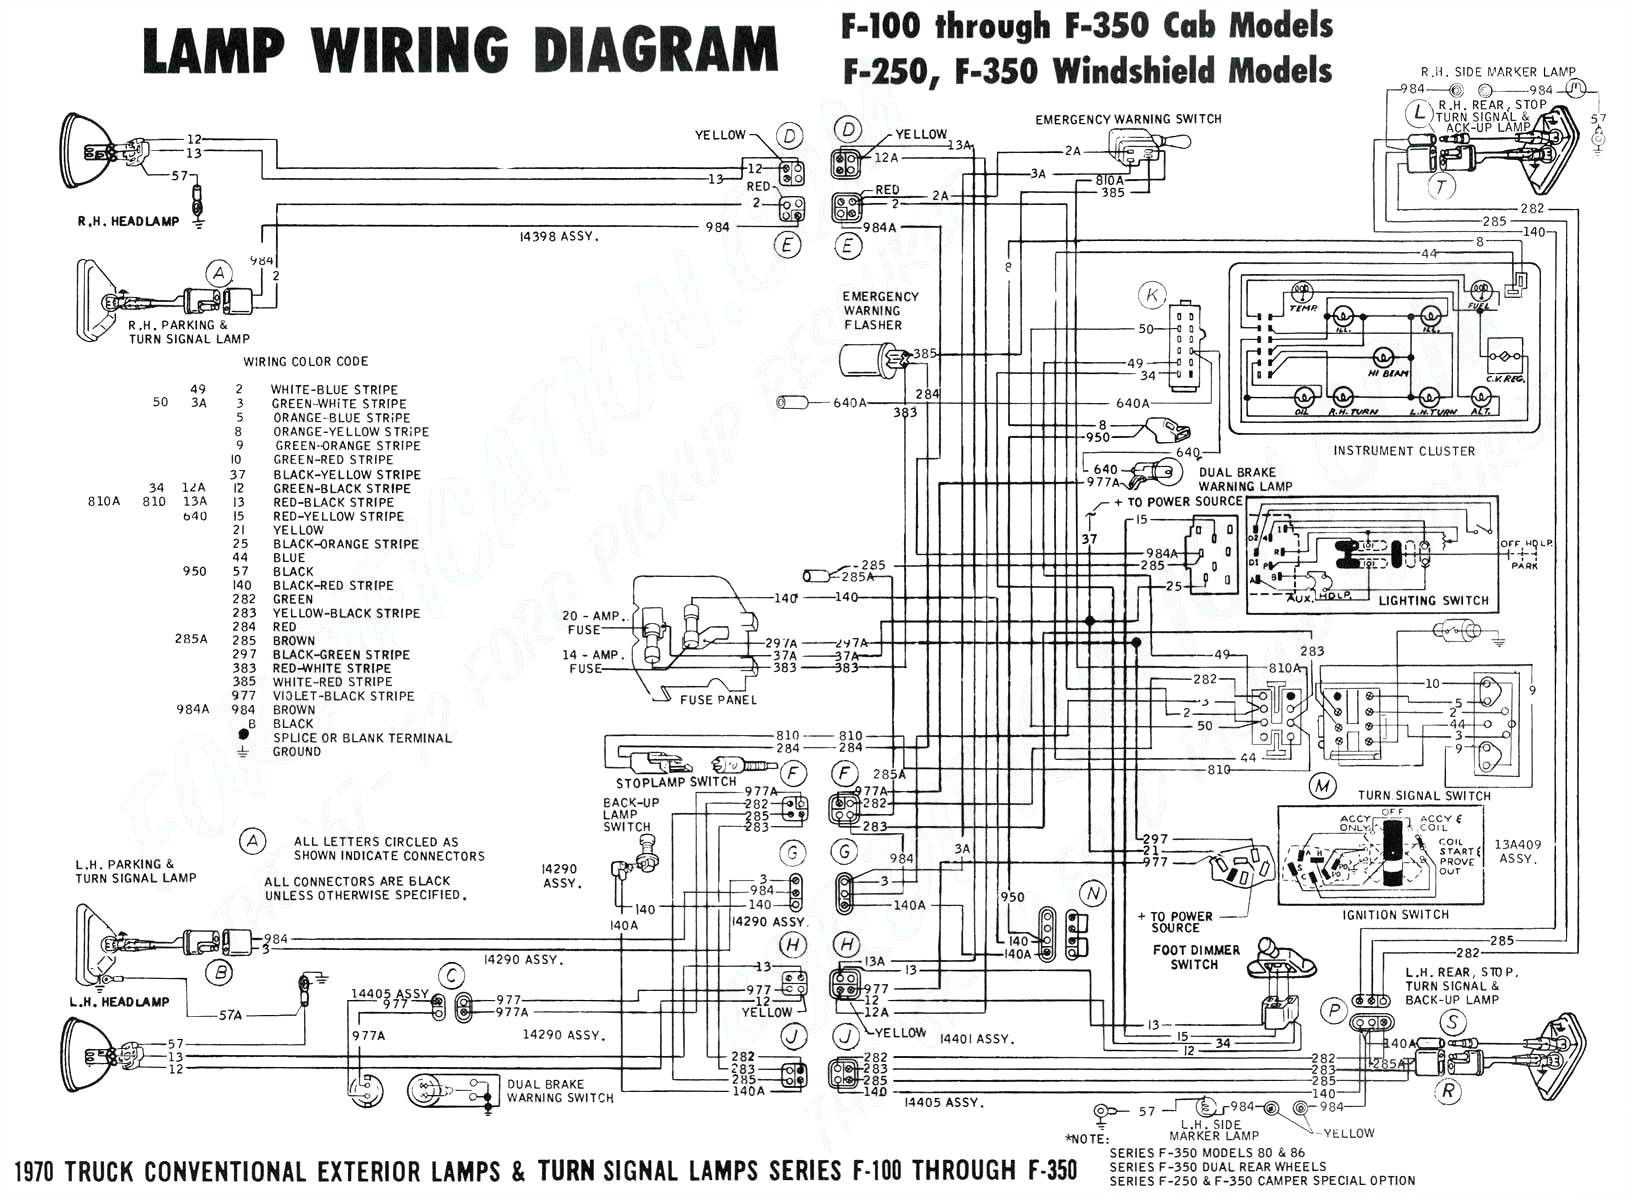 Schematic Vs Wiring Diagram top Hat Trailers Wire Schematic Wiring Diagram Datasource